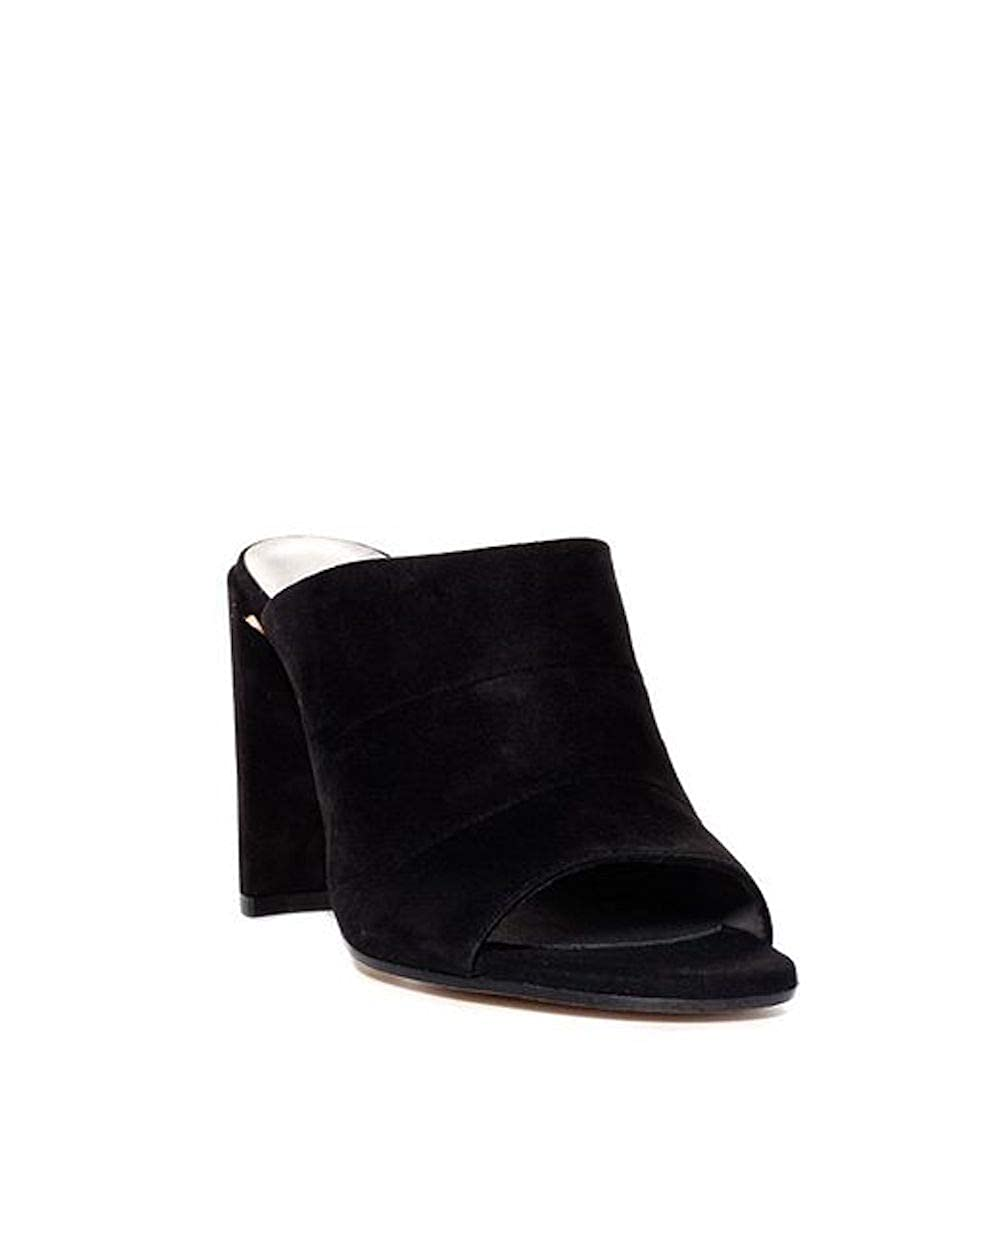 Black Stuart Weitzman Womens Sequel Slide Sandal